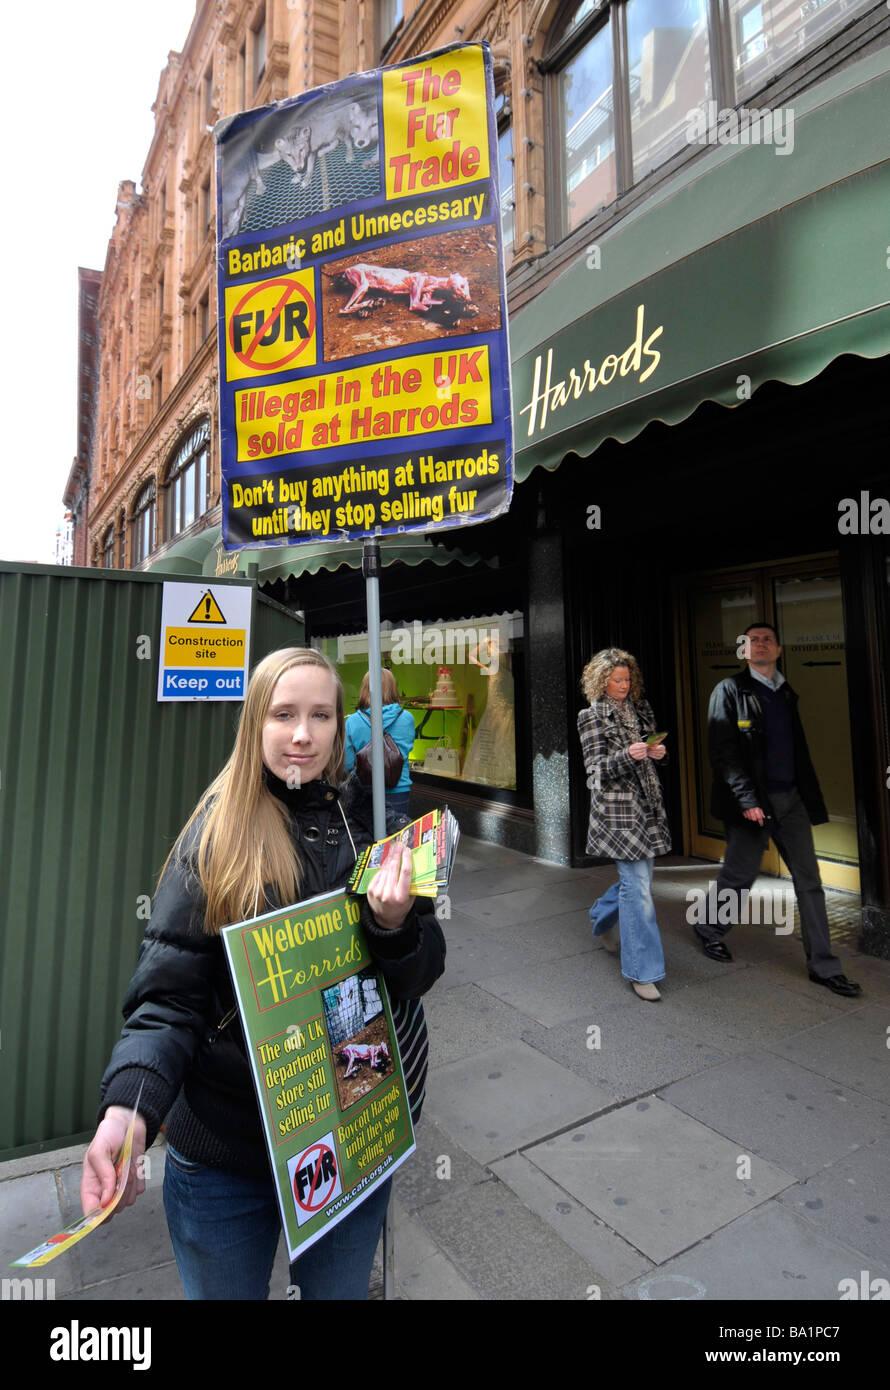 Anti pieles manifestante ventas fuera de Harrods, Londres, Inglaterra, Reino Unido Imagen De Stock